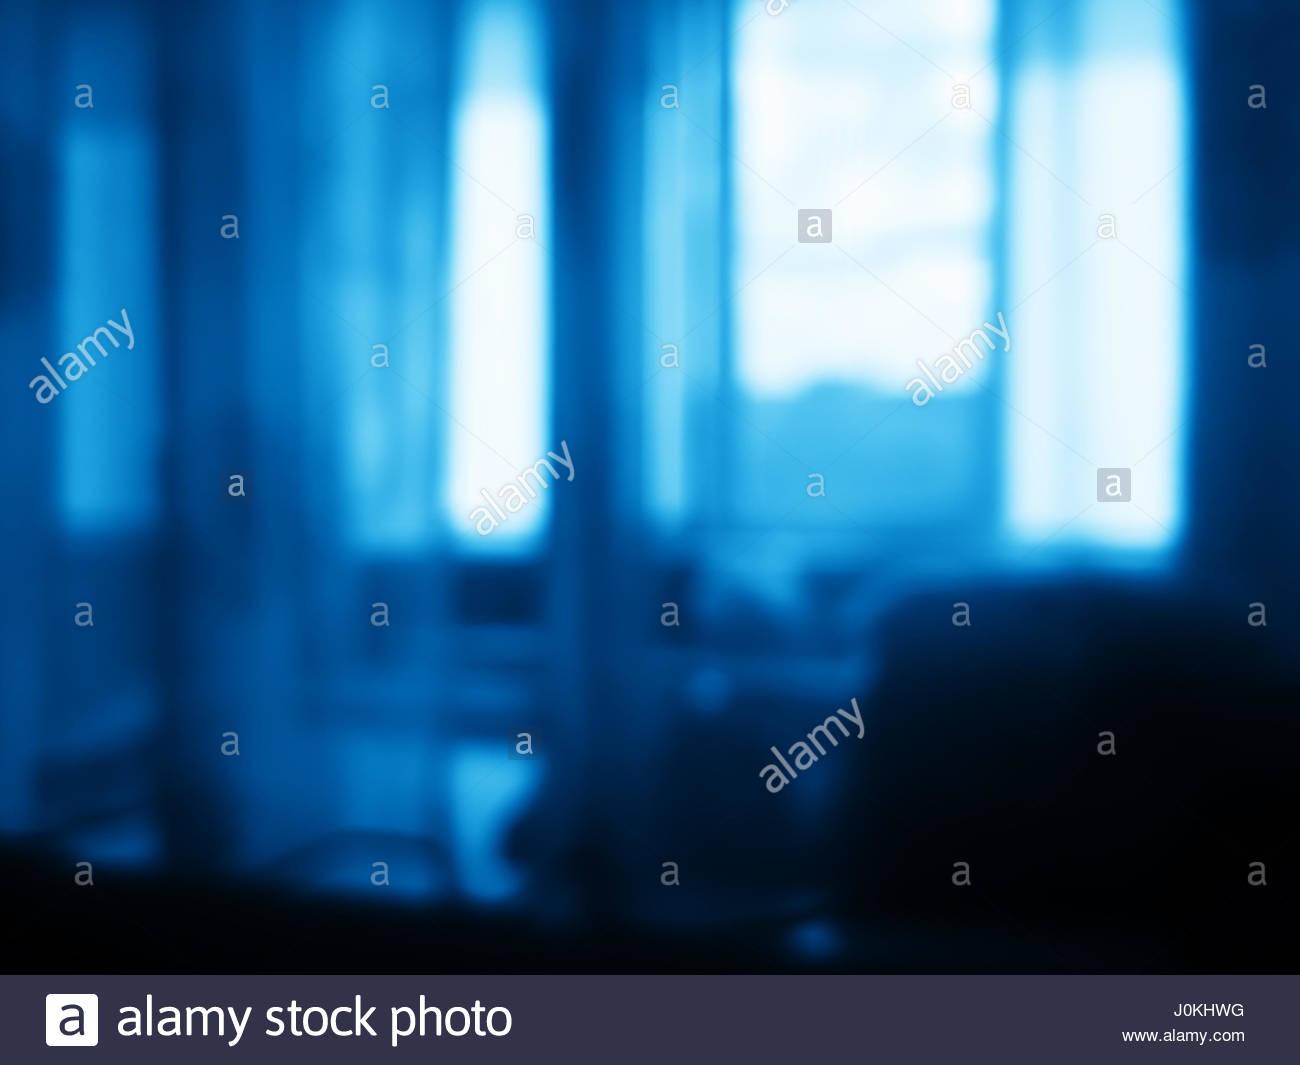 Horizontal Motion Blur Background Hd Immagini Horizontal Motion